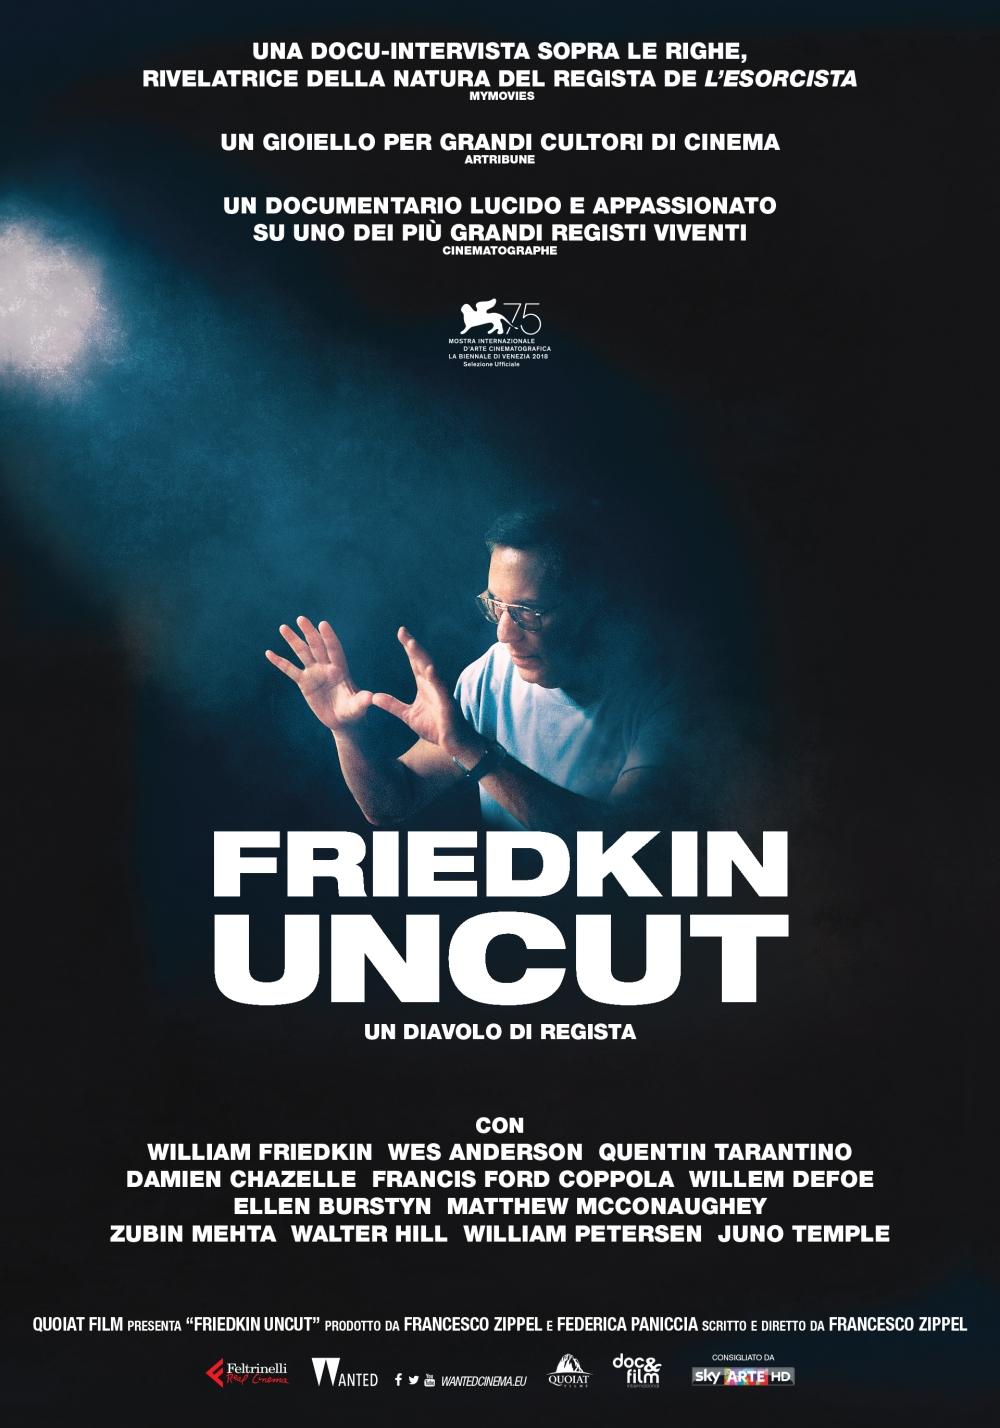 Friedkin uncut, locandina, poster